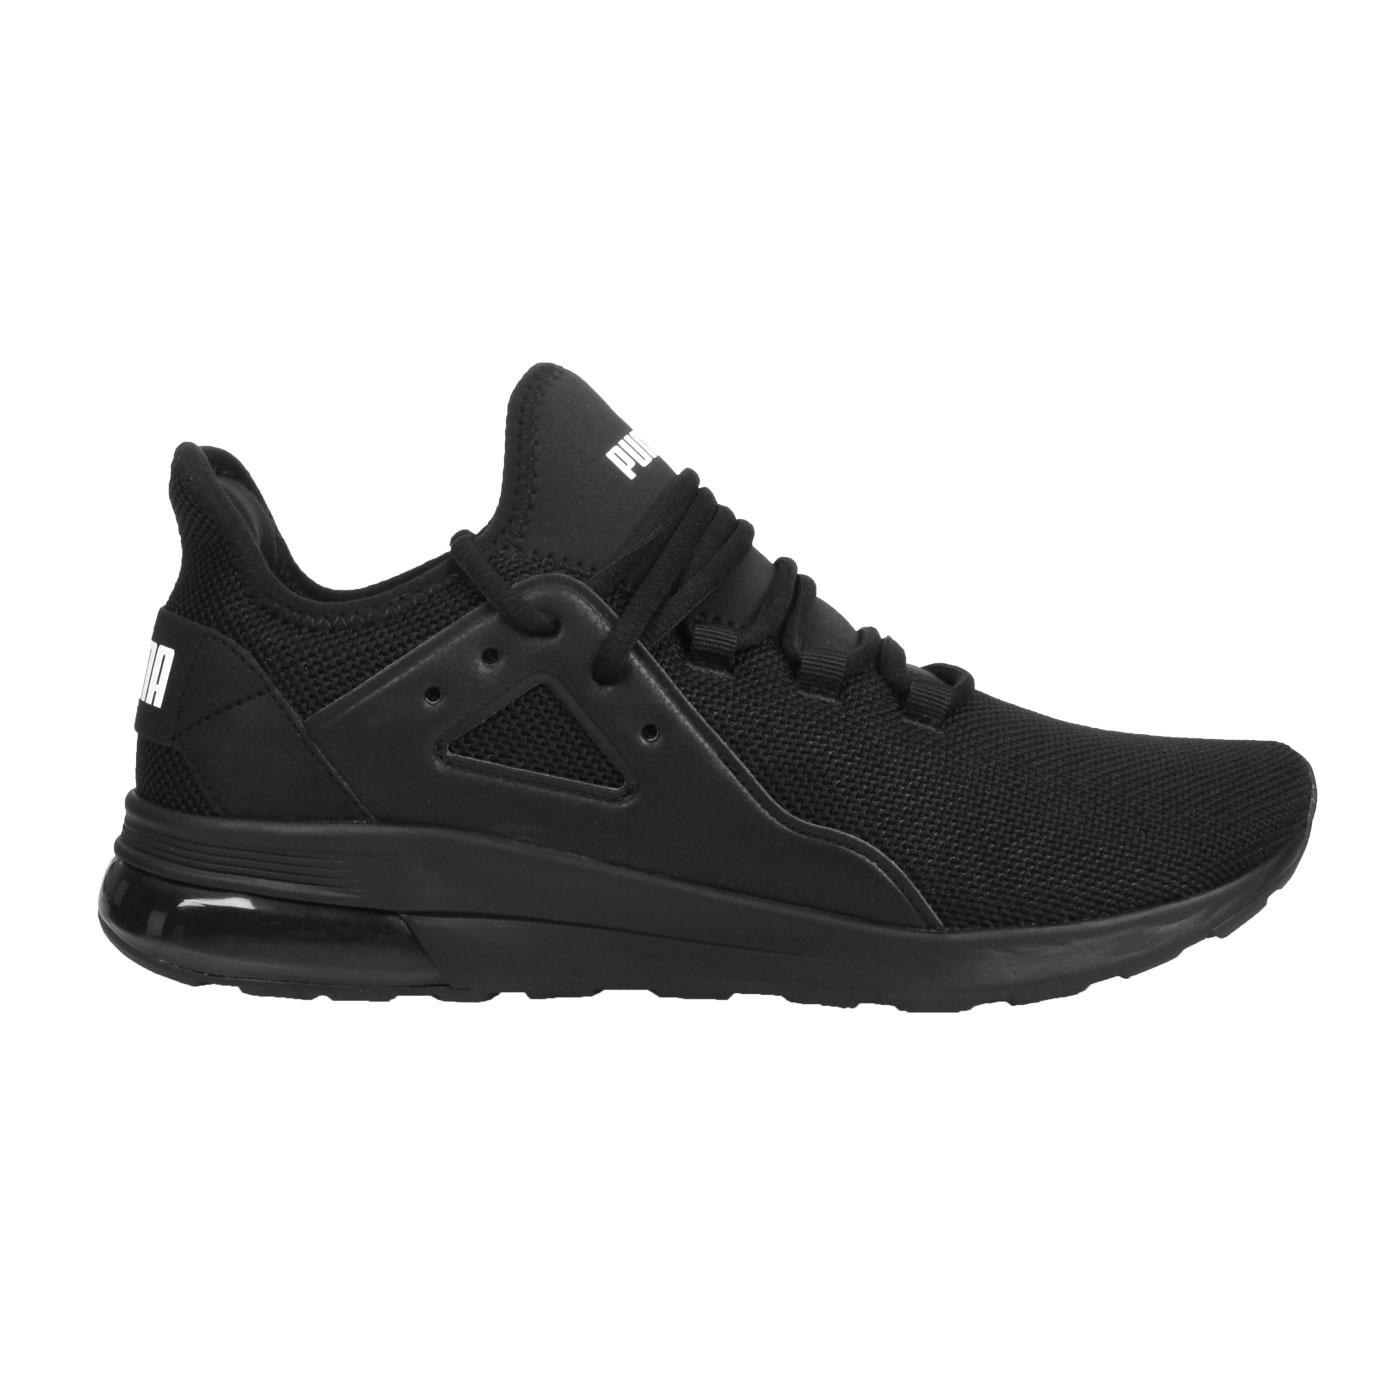 PUMA 男款慢跑鞋  @Electron Street@36730901 - 黑白